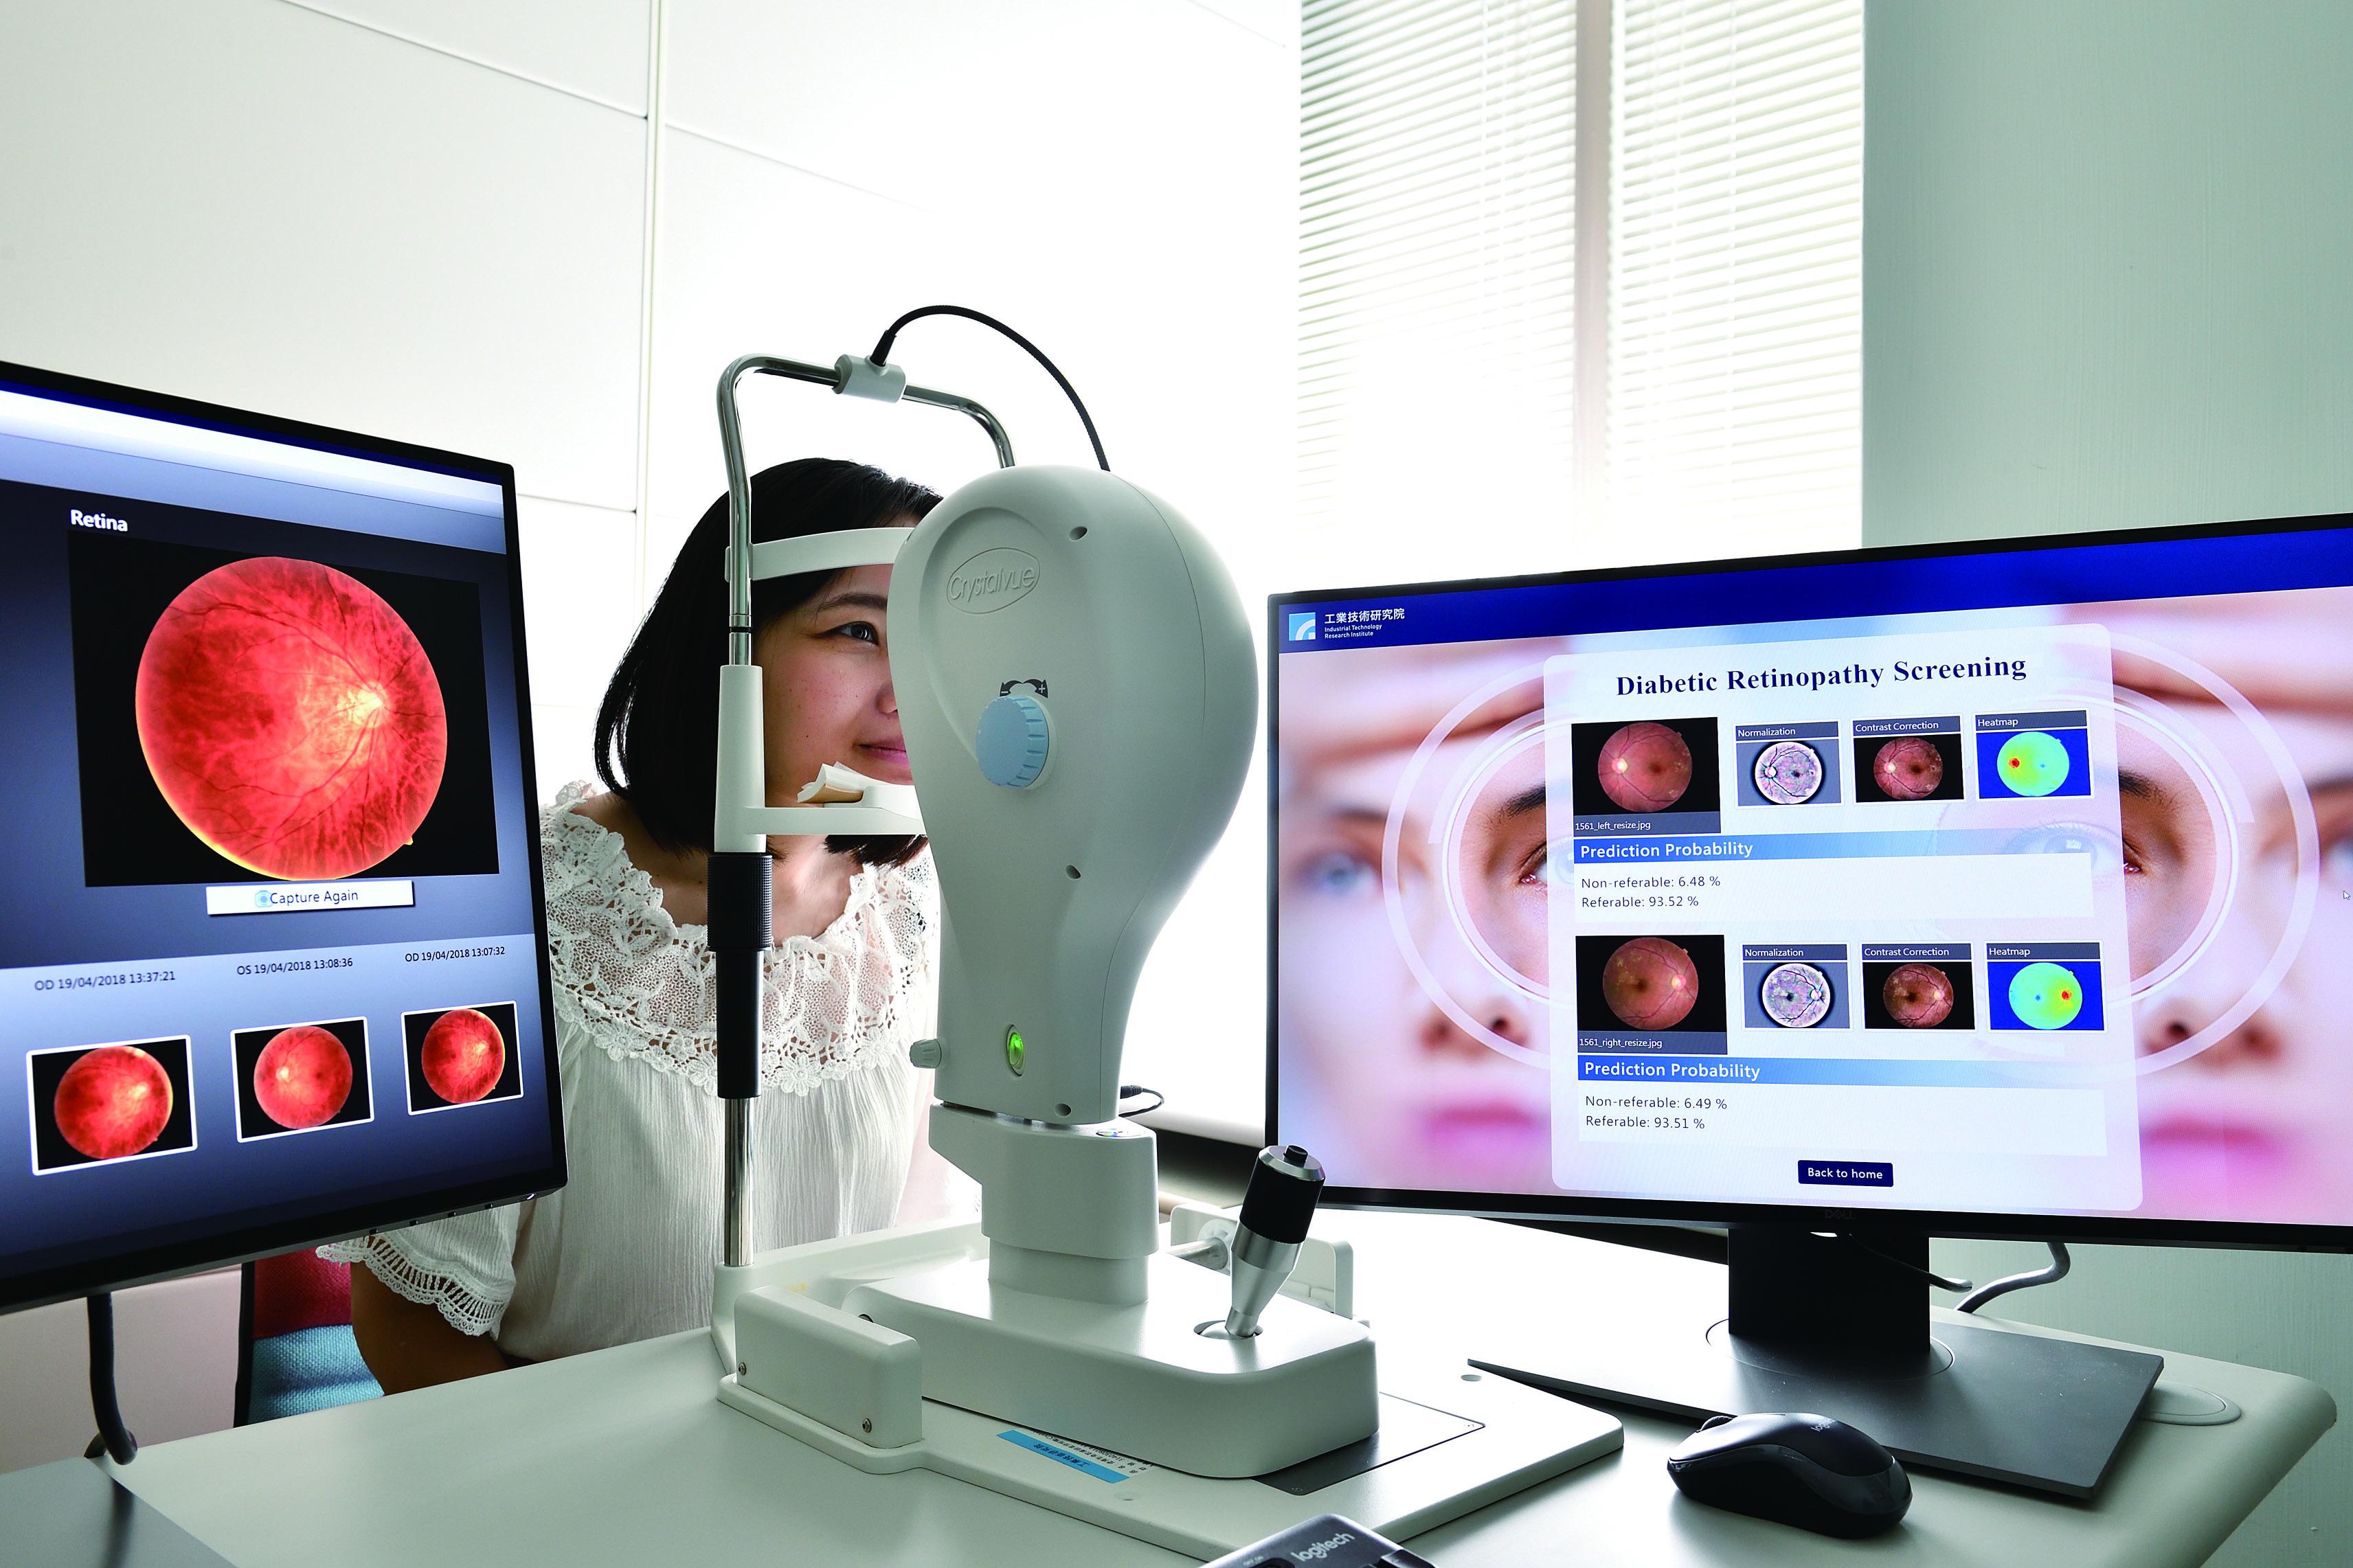 AI也可以挑病眼 精準偵測糖尿病視網膜病變